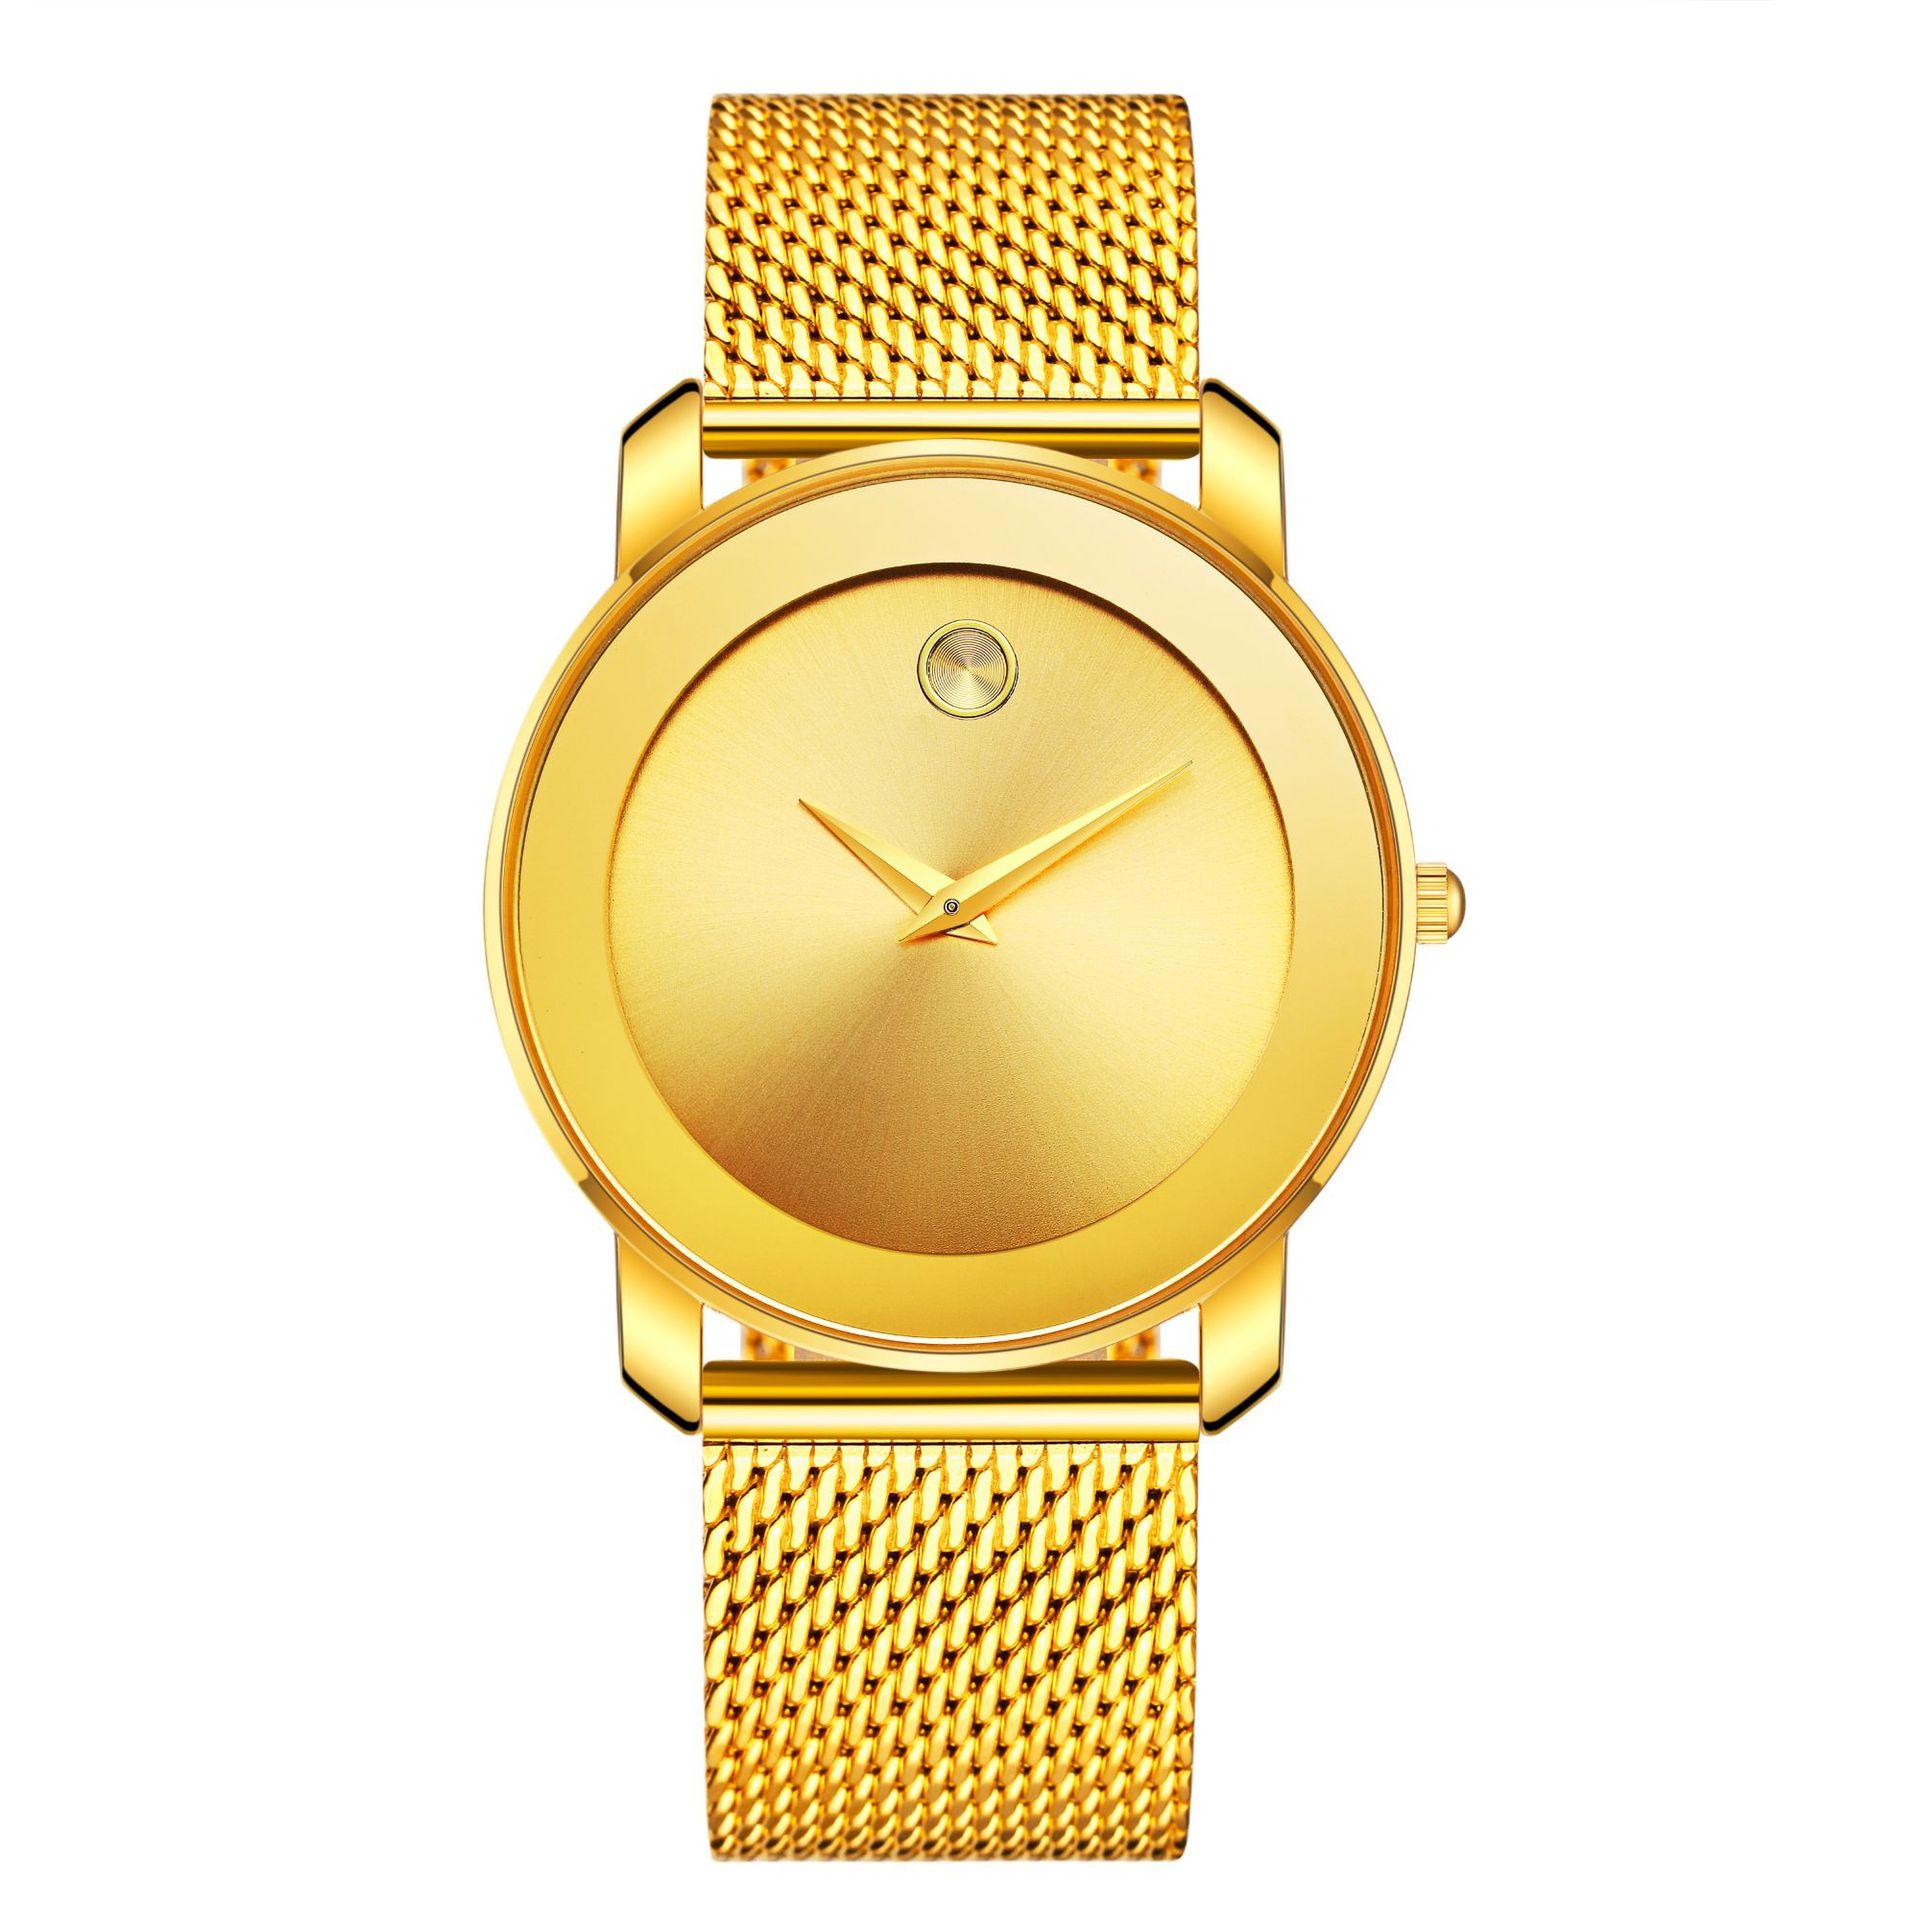 Men's Watches Men Watch 2019 Luxury Brand Waterproof Relogio Masculino New Arrival Golded Clock Gold Big Hot Men's Wrist Watch